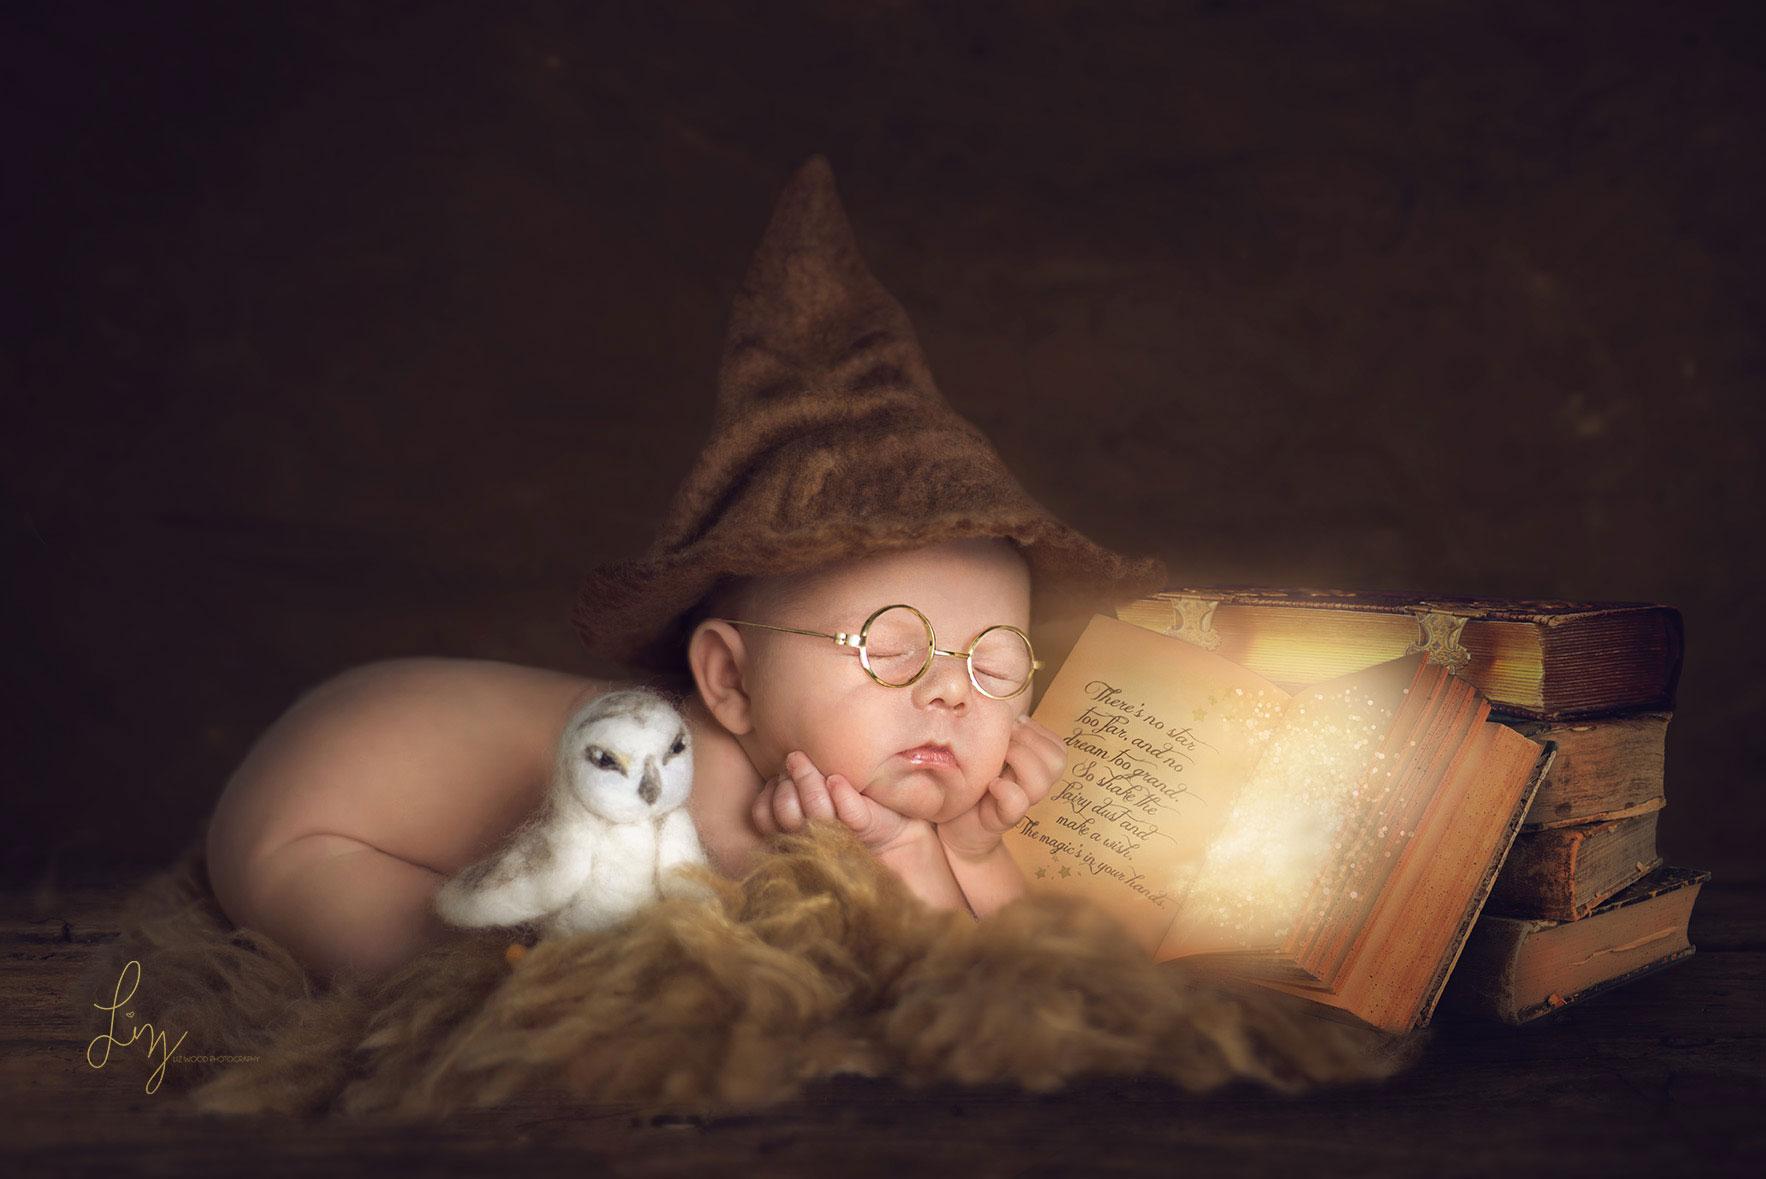 Baby dressed as Harry Potter asleep reading a magic book. Essex creative newborn photographer